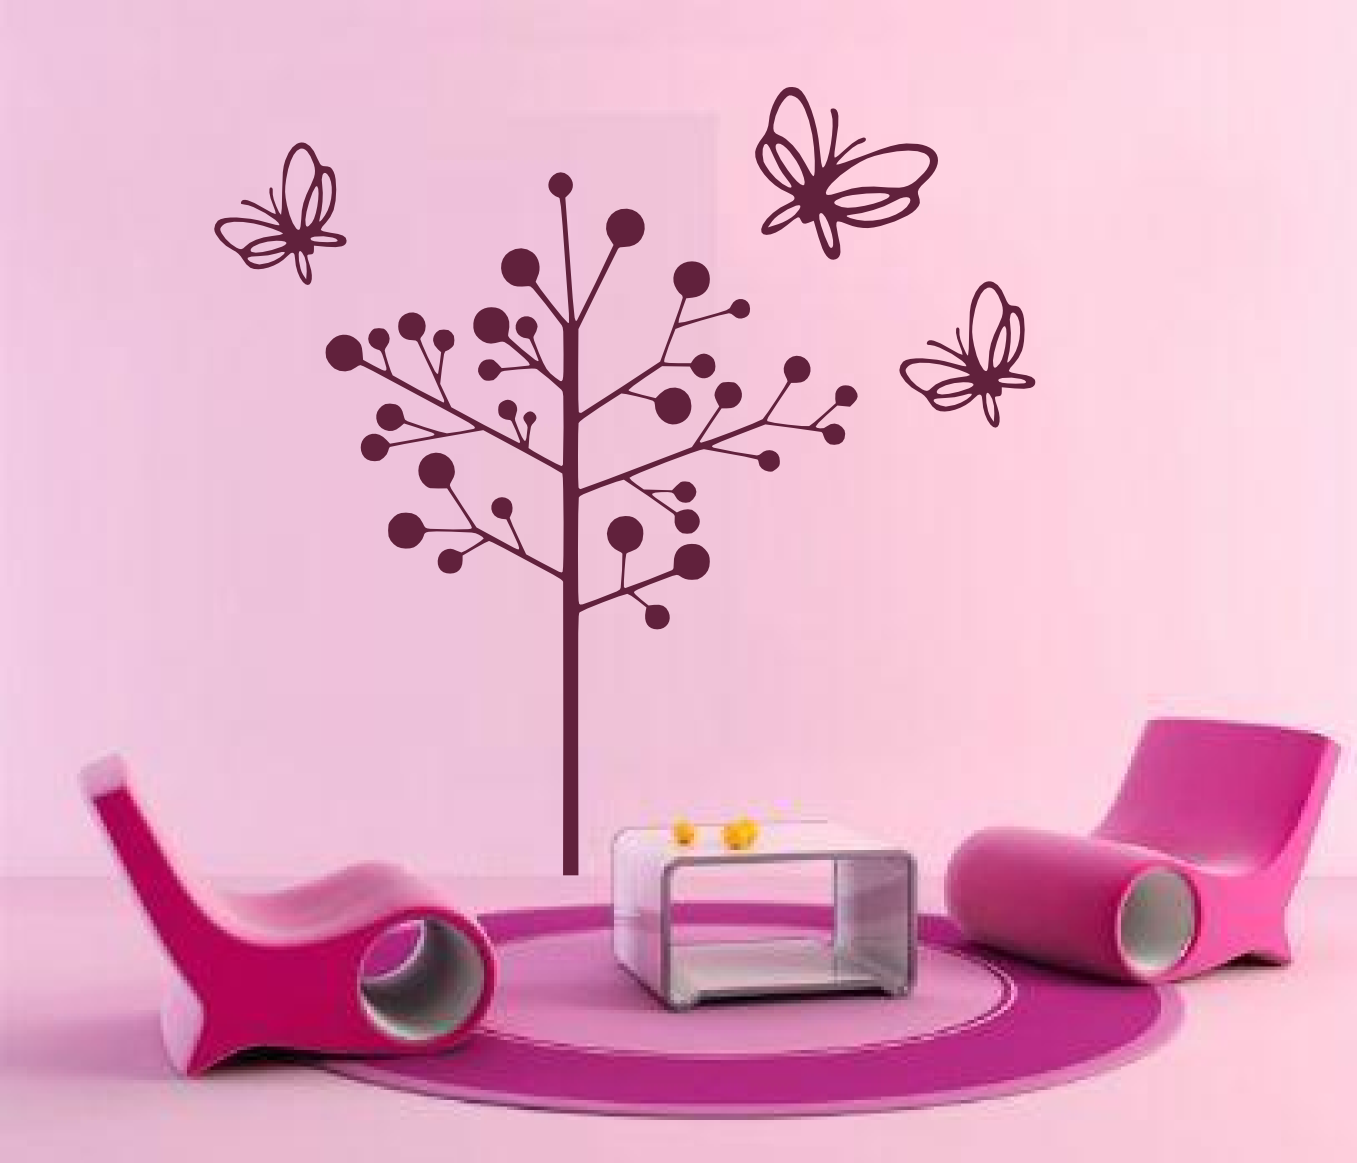 Vinilos decorativos para tu hogar cuartos infantiles for Vinilos decorativos para cuartos